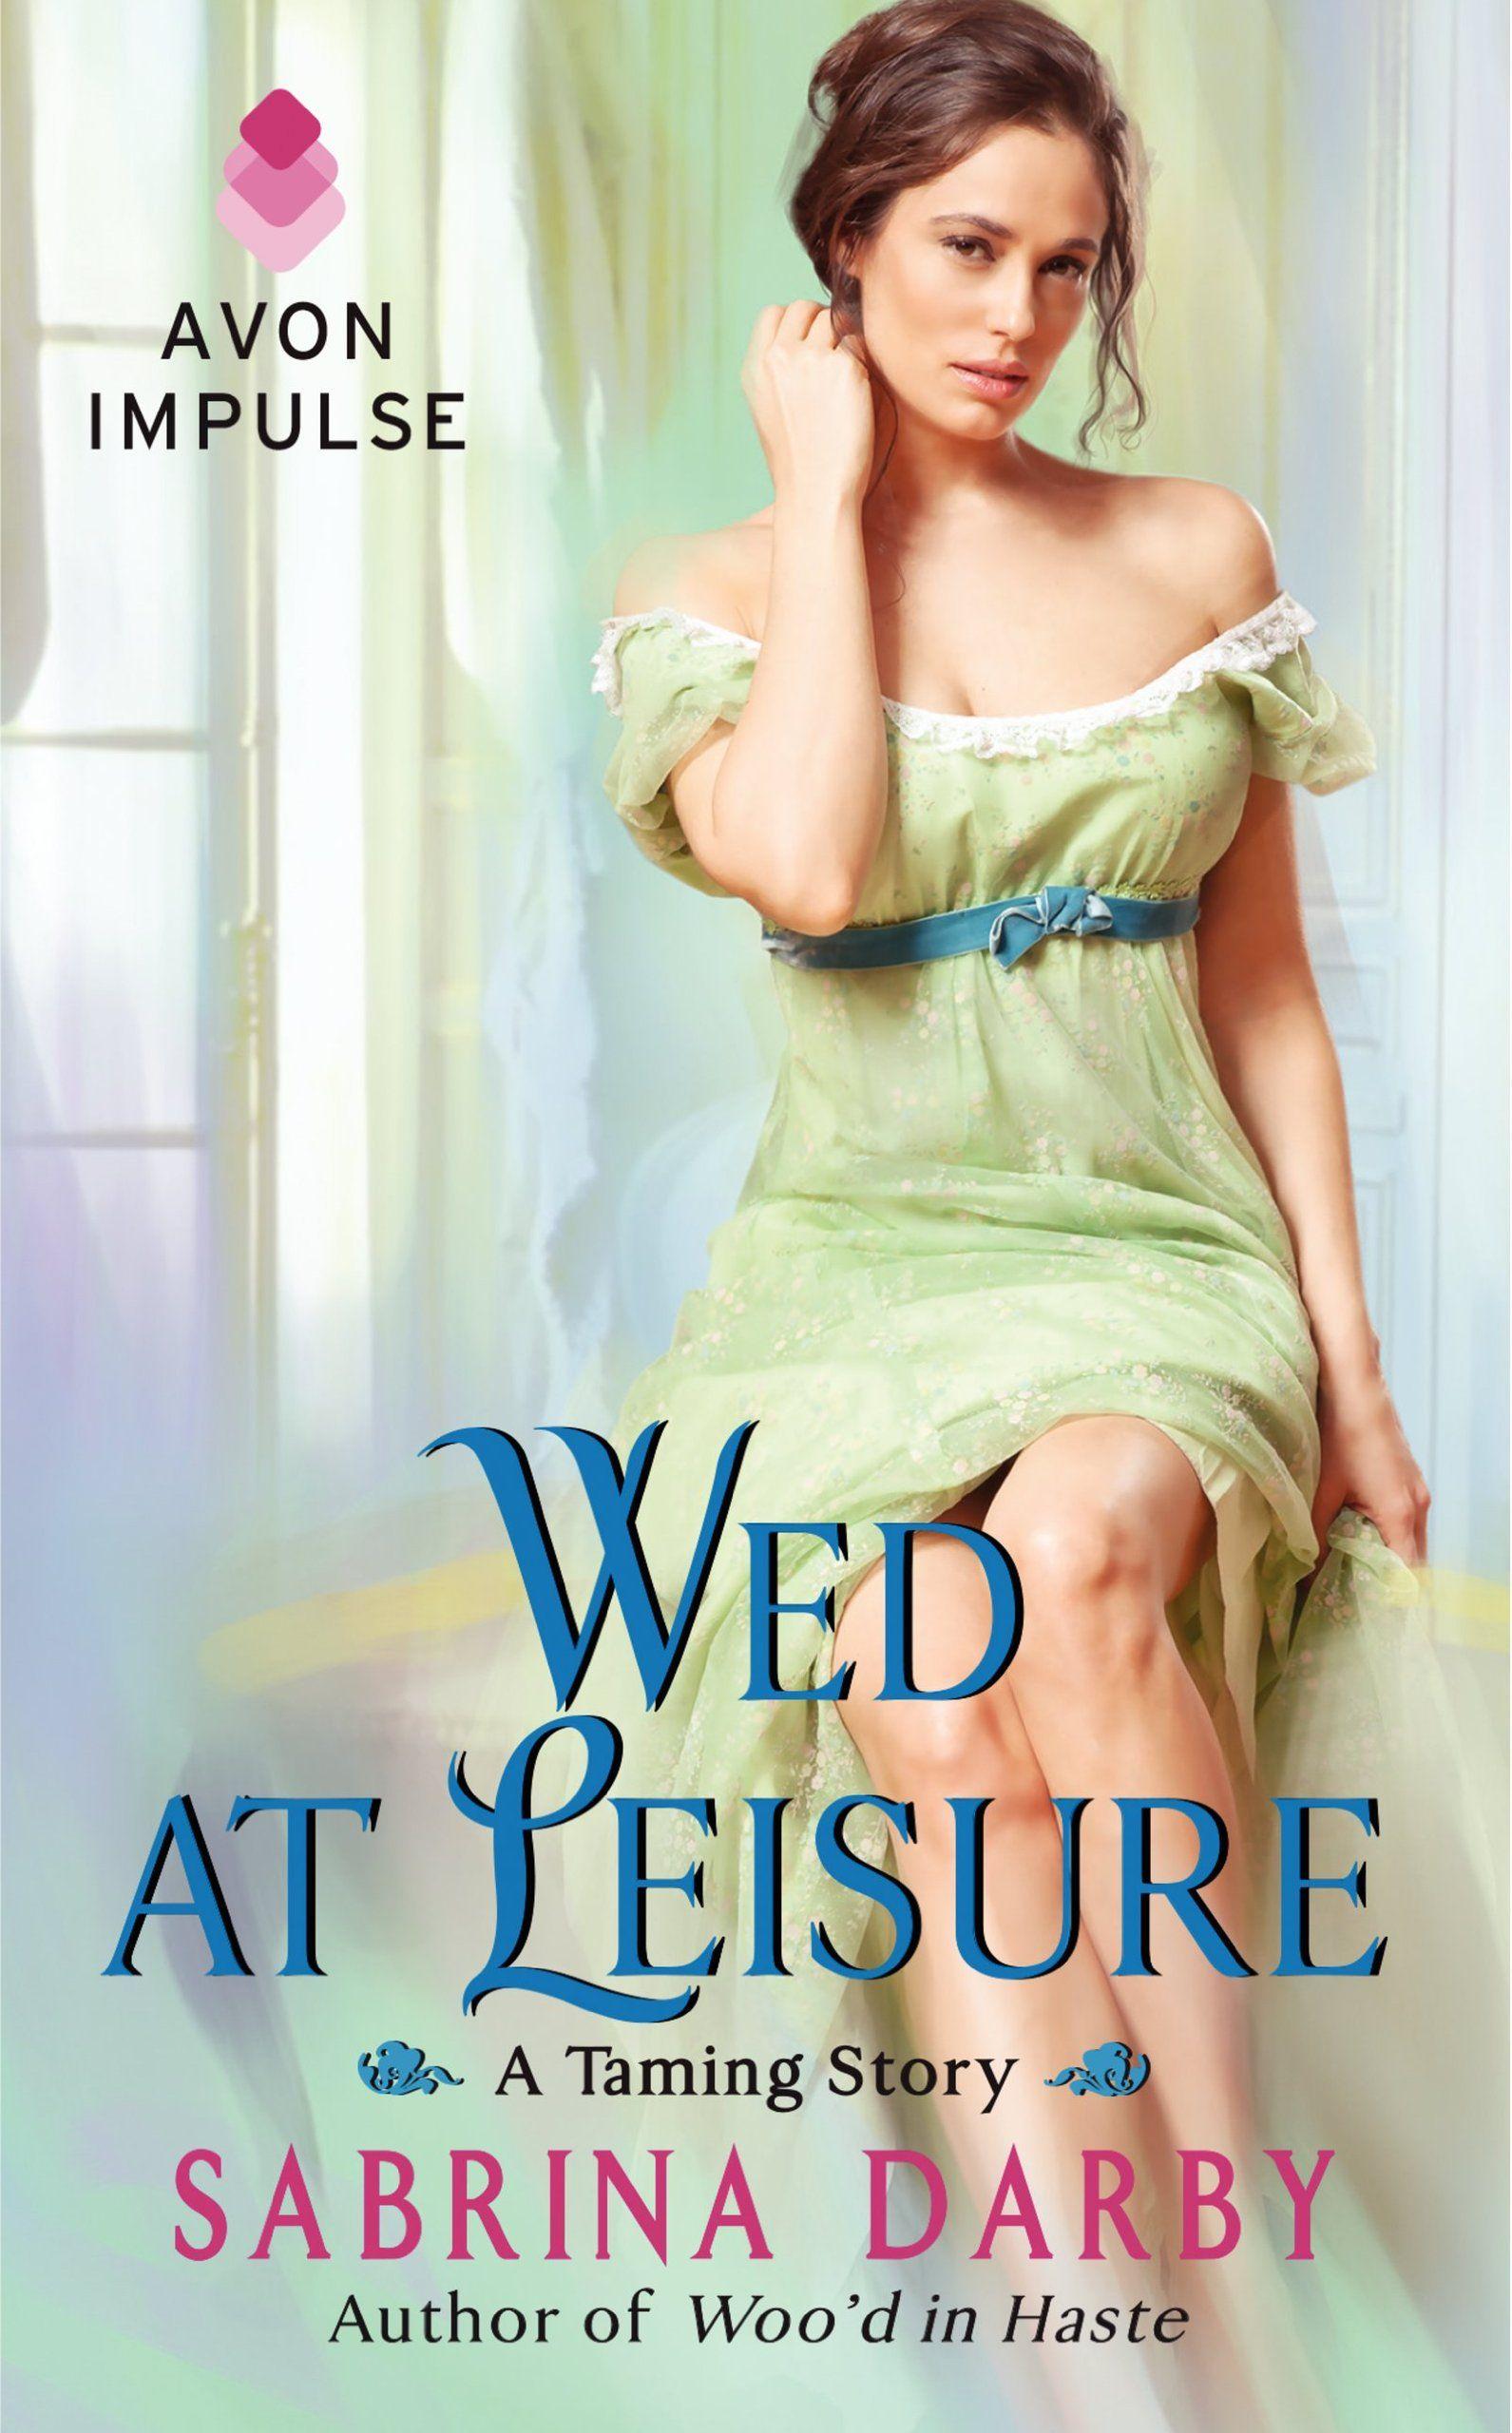 Sabrina Darby - Wed at Leisure